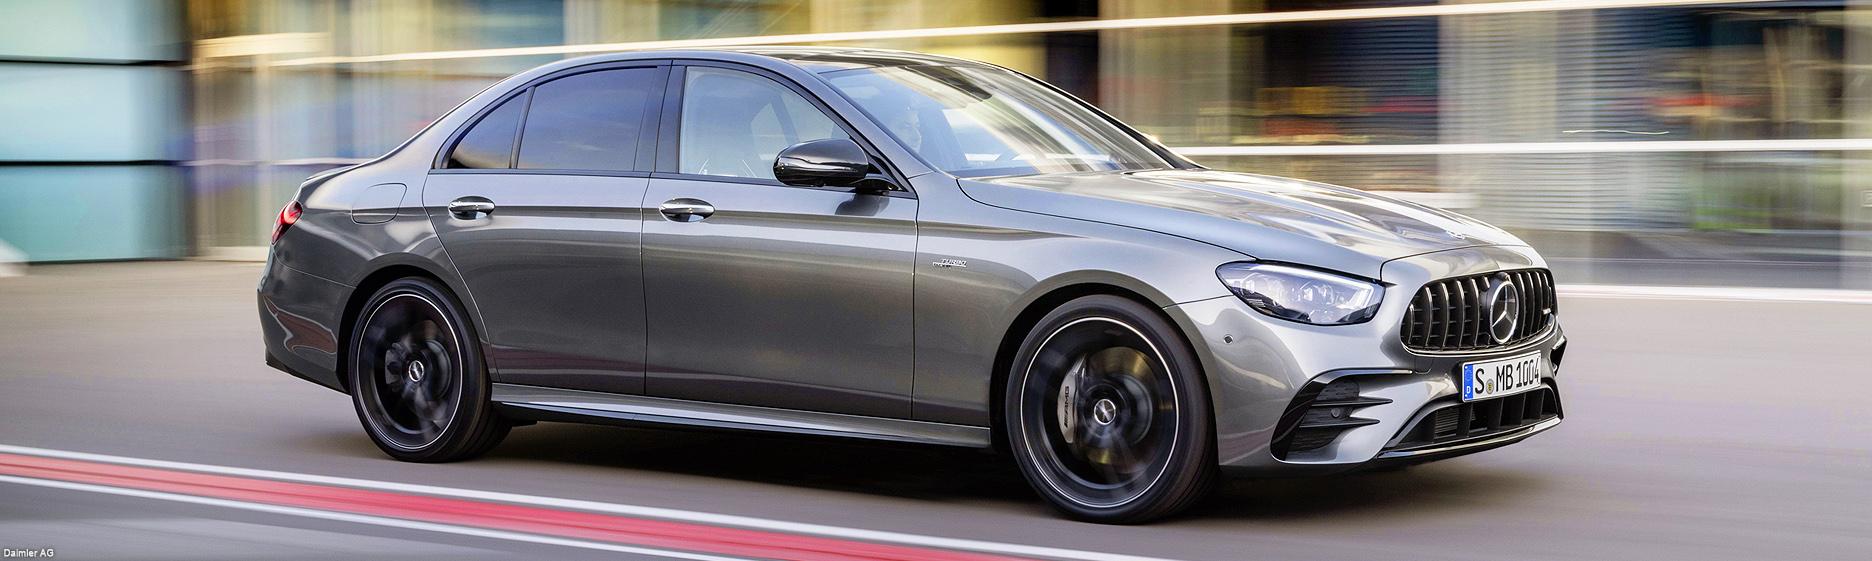 Mercedes-Benz E-Class sigue a la vanguardia de los vehículos de lujo